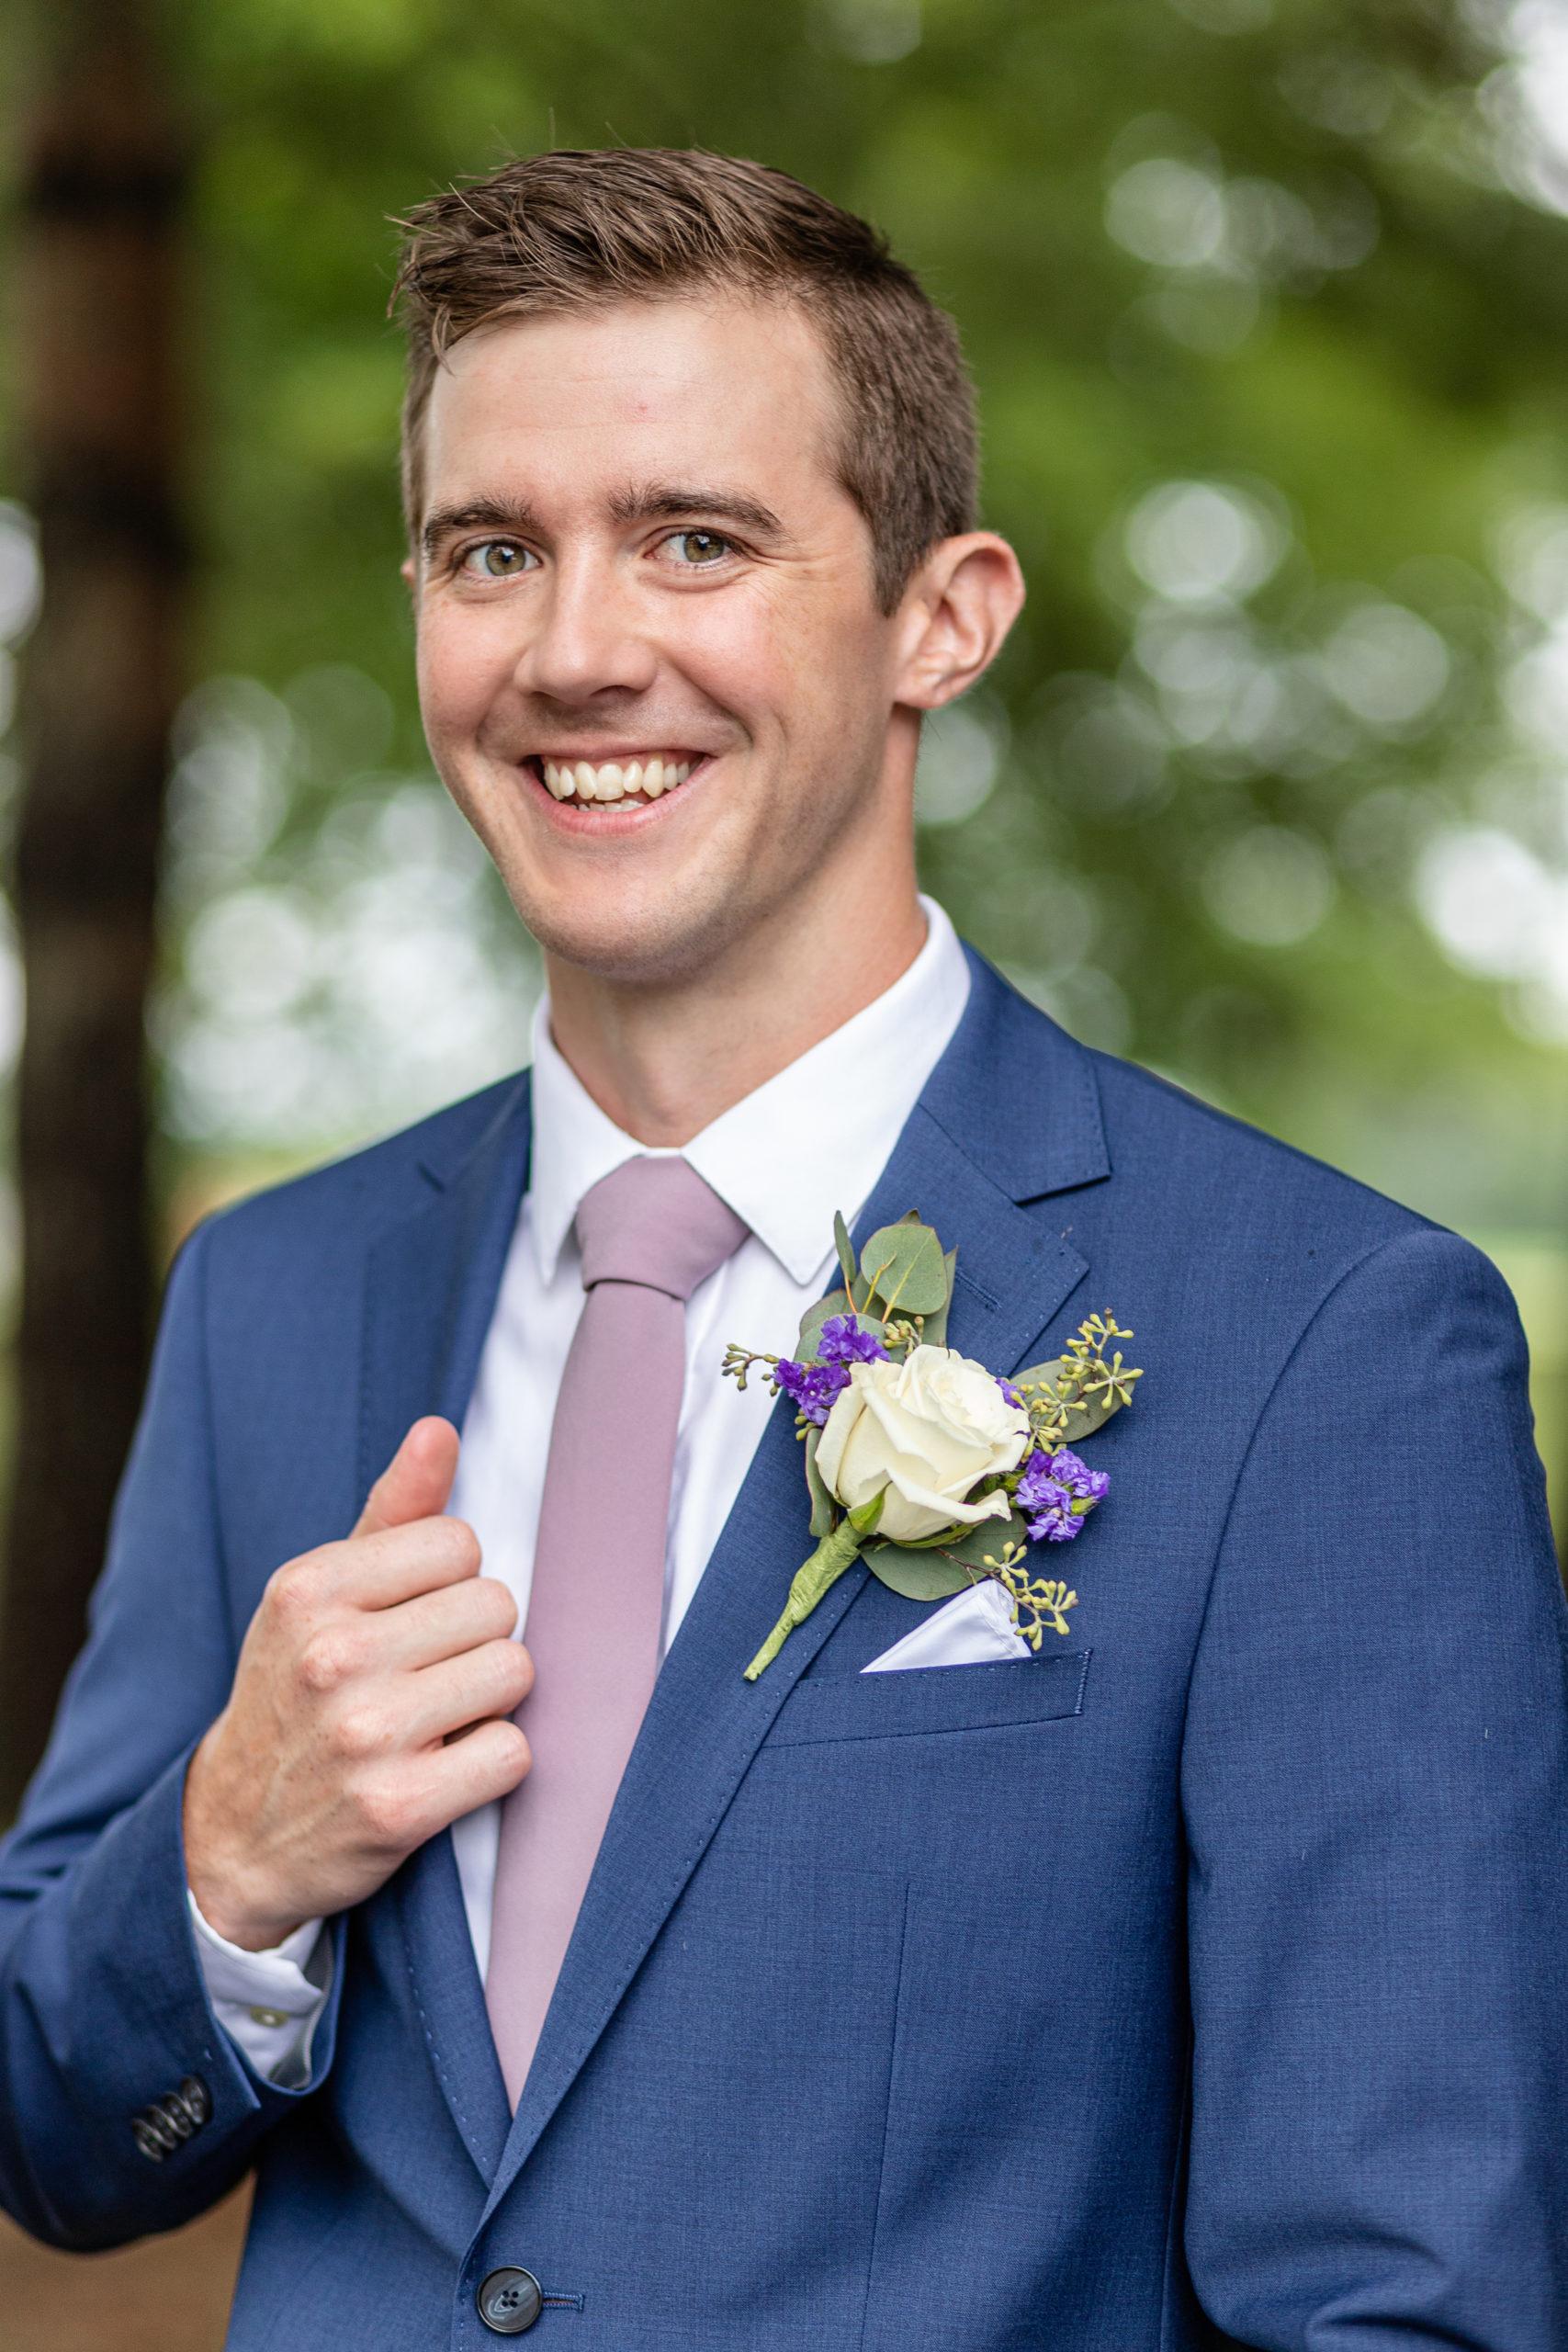 wedding photography, groom in blue tux, woodland wedding, summer romance wedding, lakeside wedding, purple wedding accents